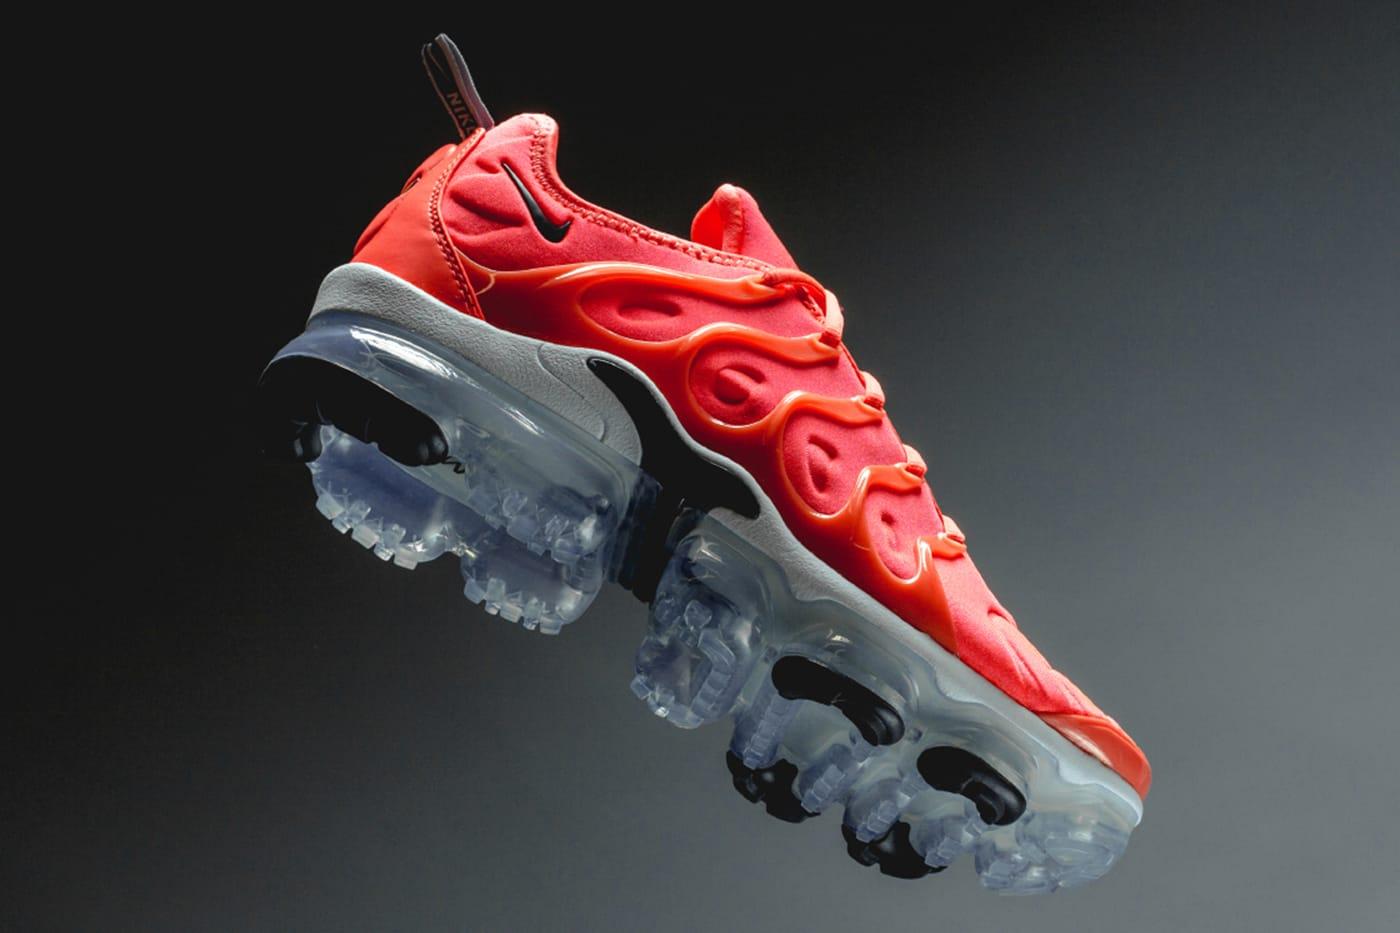 Nike Air Vapormax Plus Bright Crimson